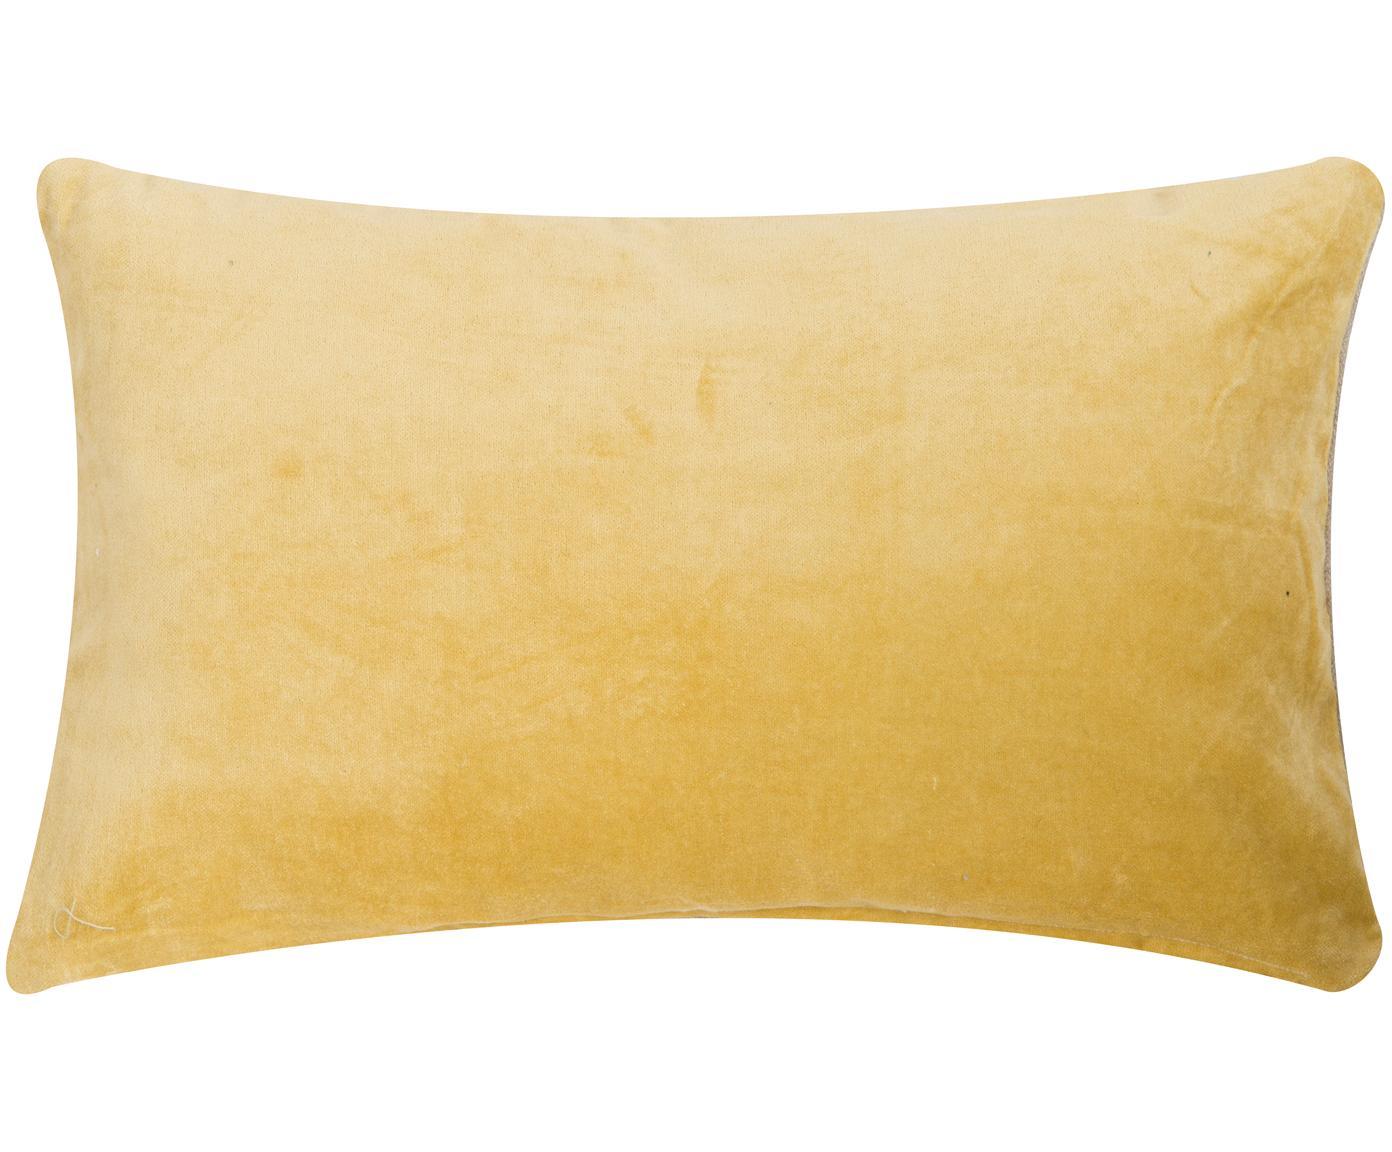 Cuscino in velluto Velvet in giallo, con imbottitura, Retro: lana, Giallo, beige chiaro, Larg. 30 x Lung. 50 cm